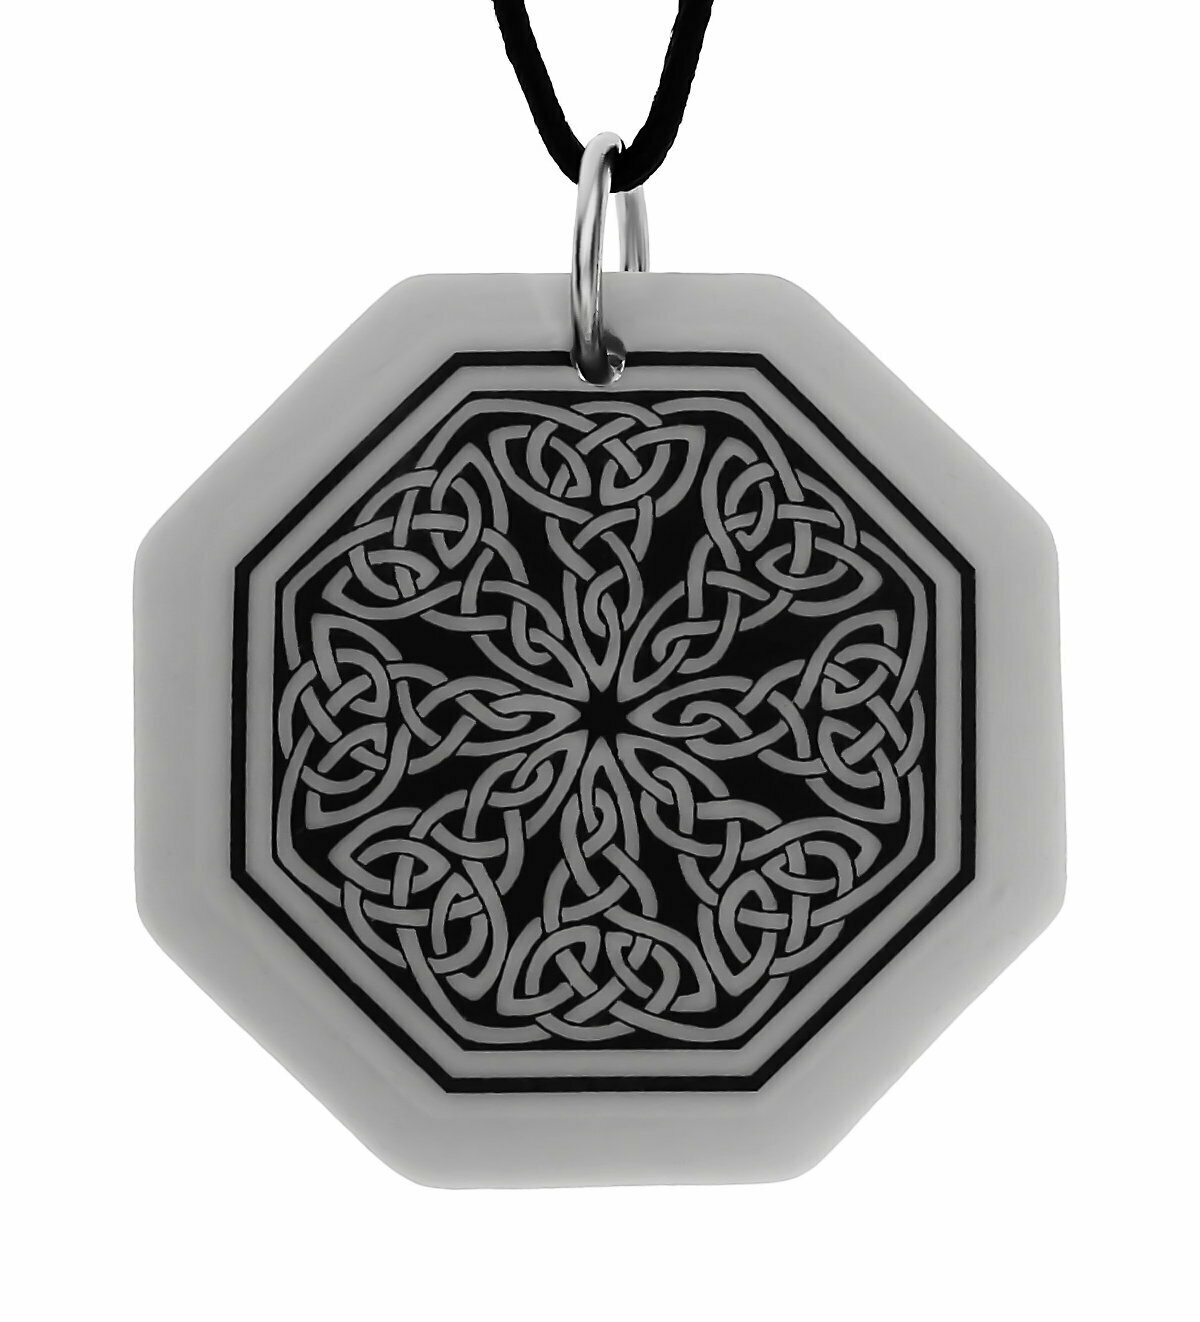 Celtic Knotwork Octagon Handmade Porcelain Pendant